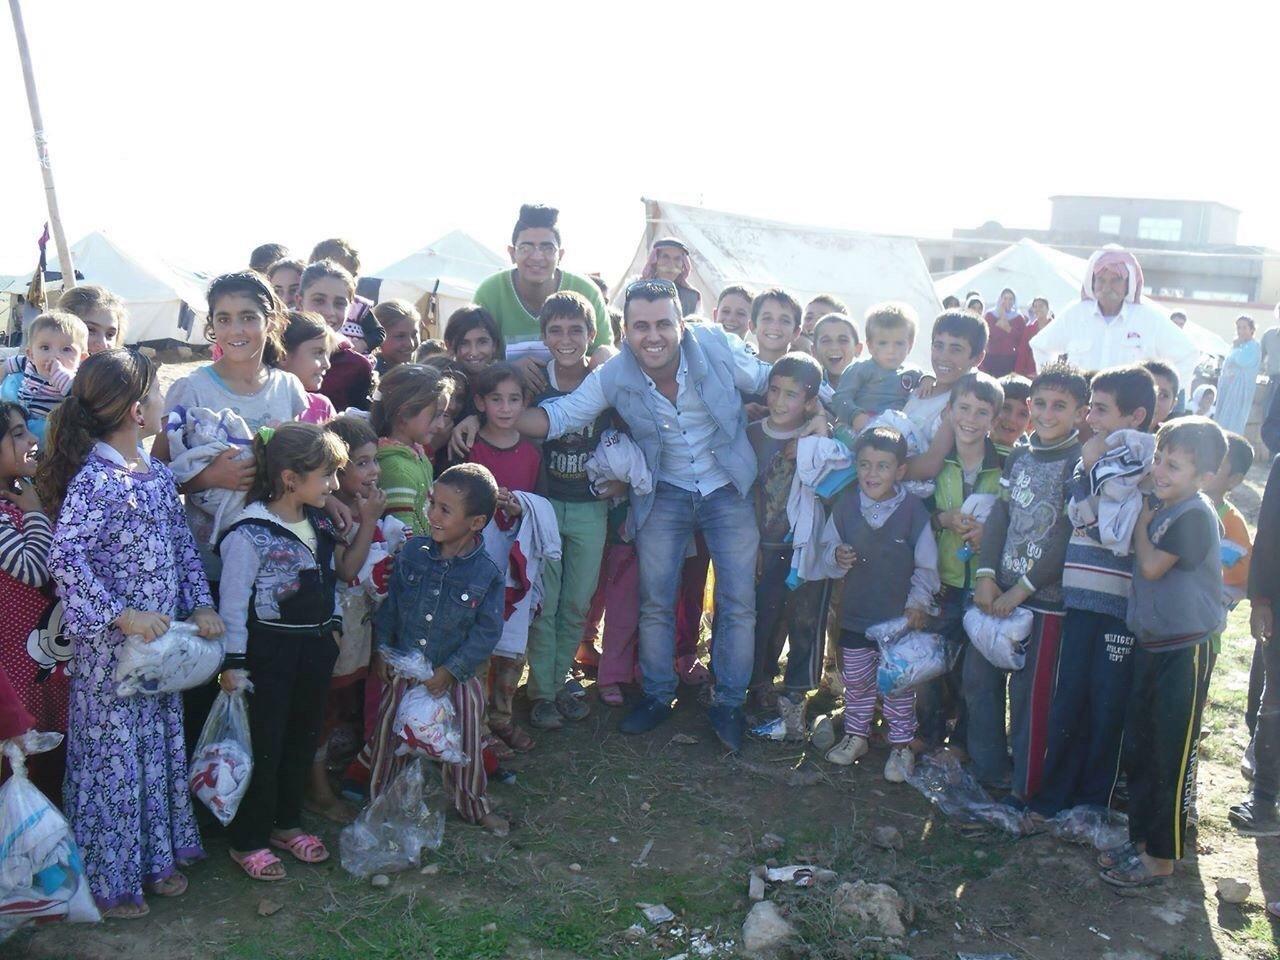 Huskers grad Falah Rashoka surrounded by refugee children at a Kurdistan campus in October 2014.